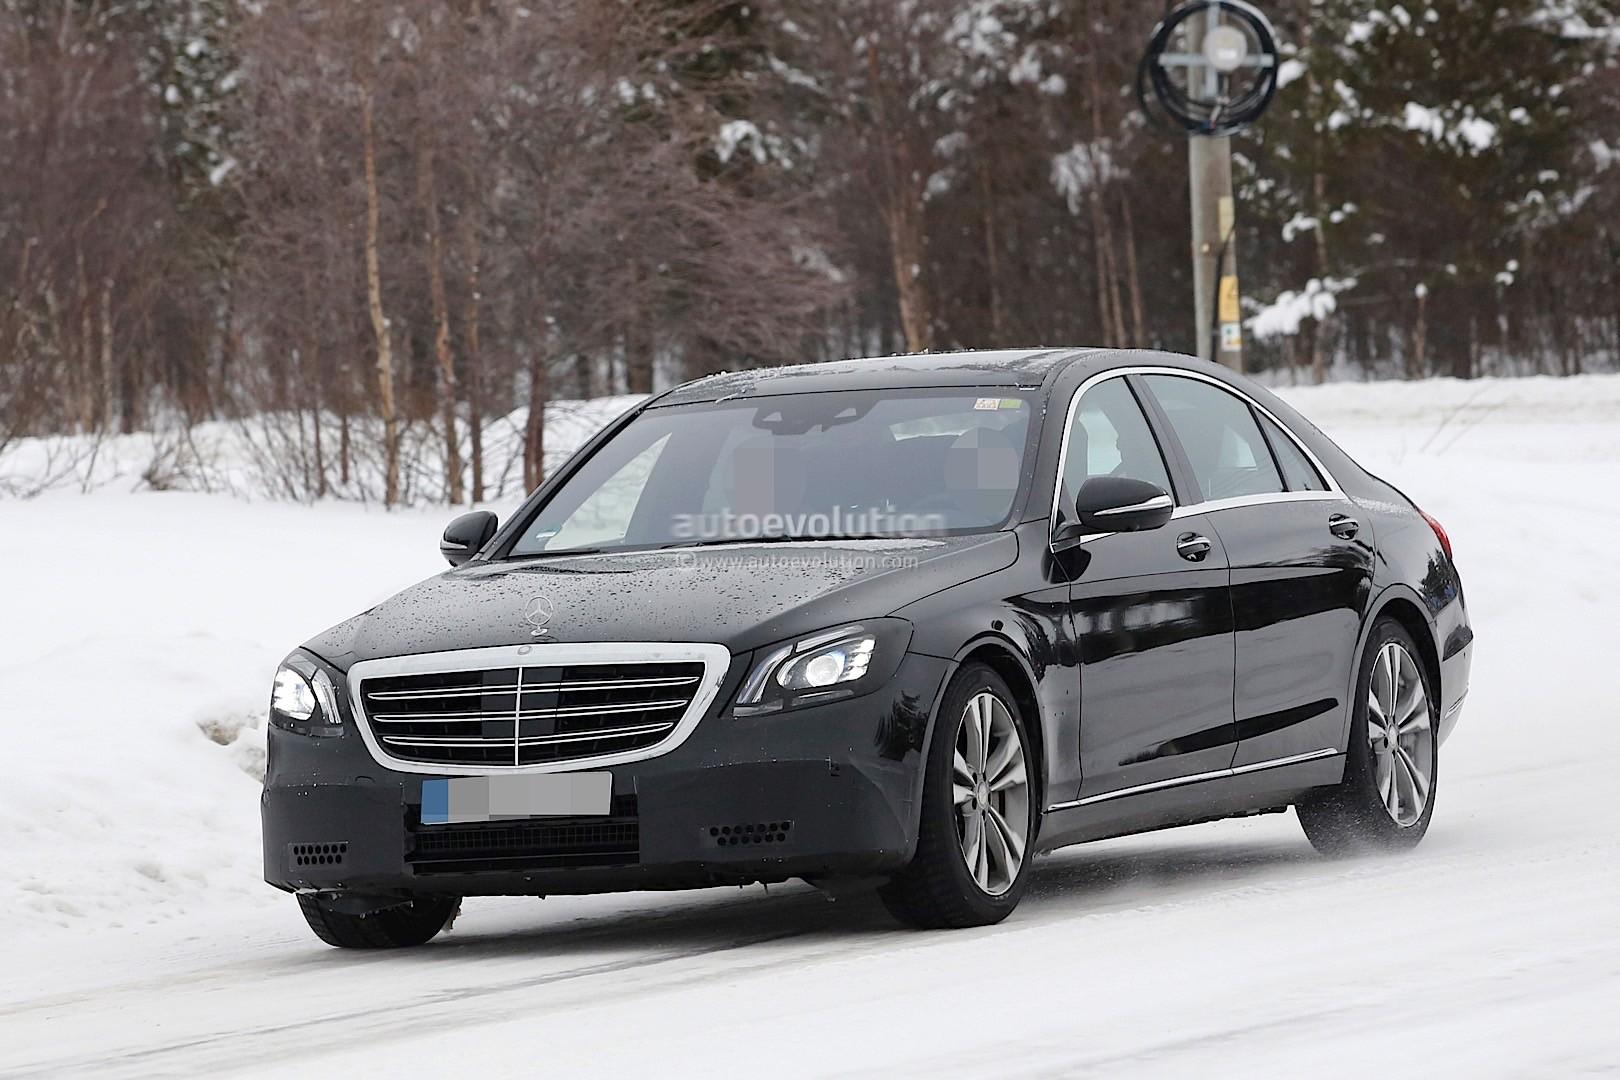 2018 Mercedes-Benz S-Class Facelift Gets a New Detailed ...